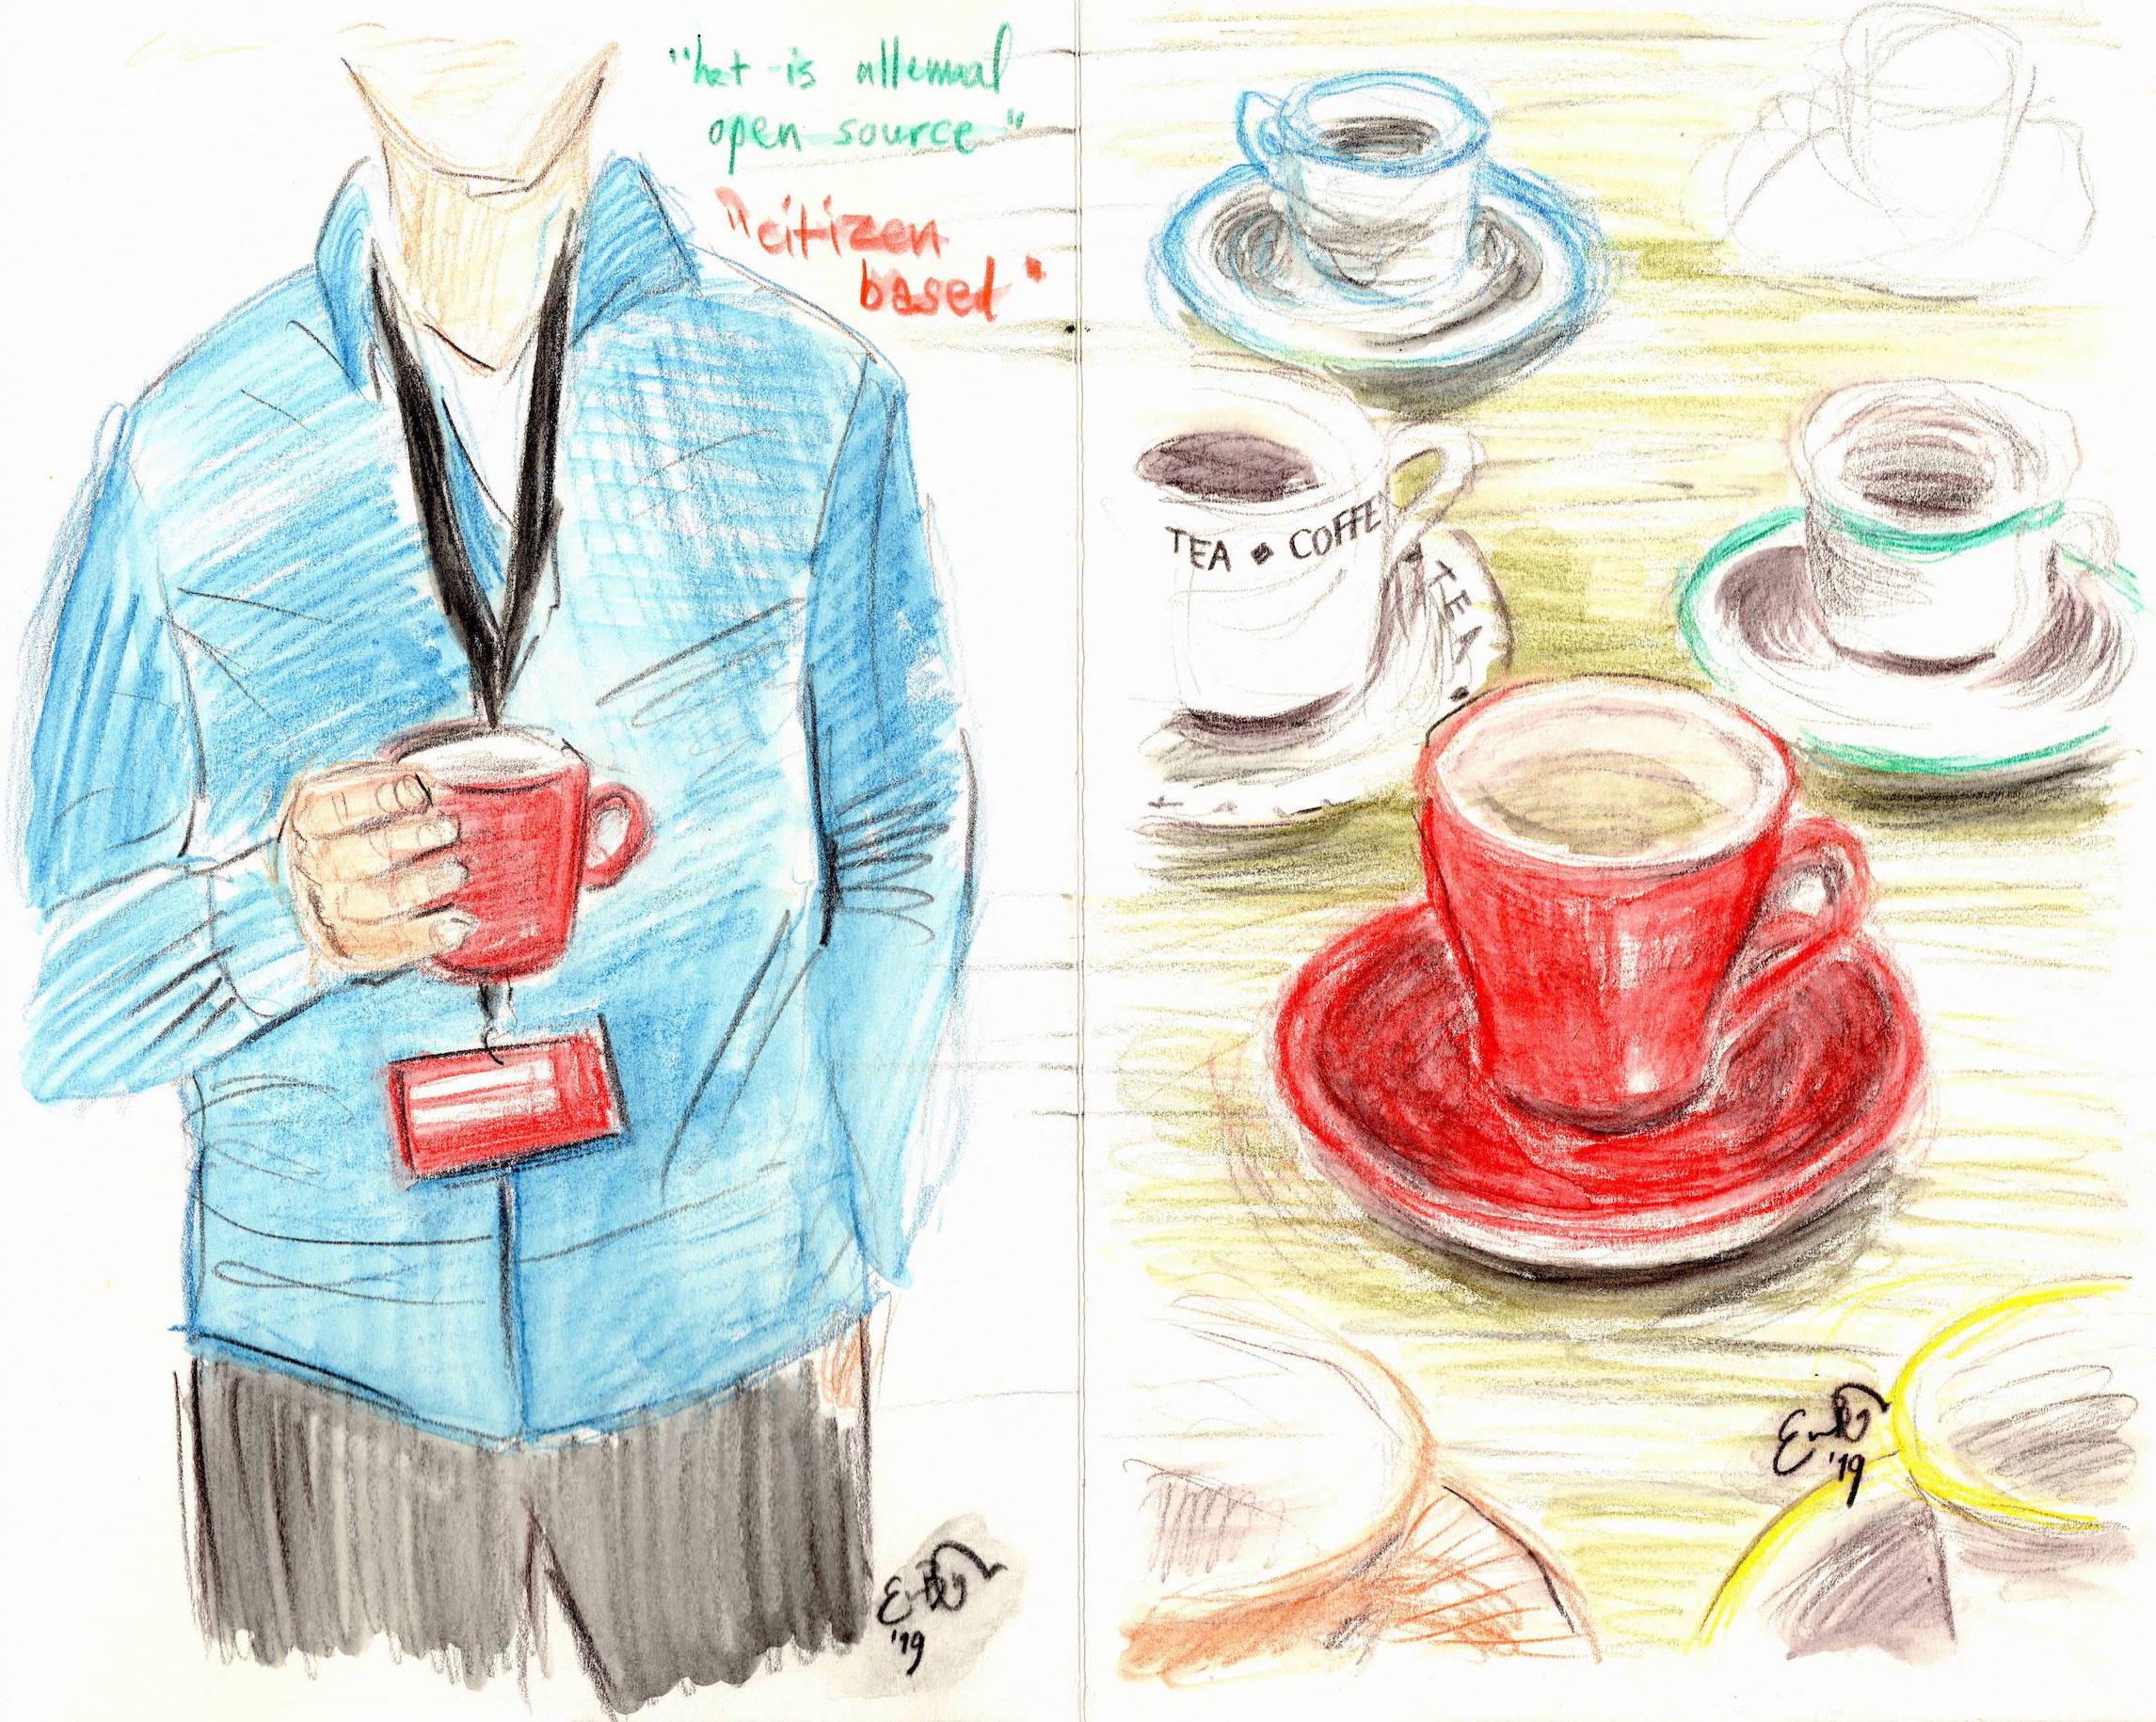 Find your cup mate, TEDxTilburg (c) Emma Bijloos 2019